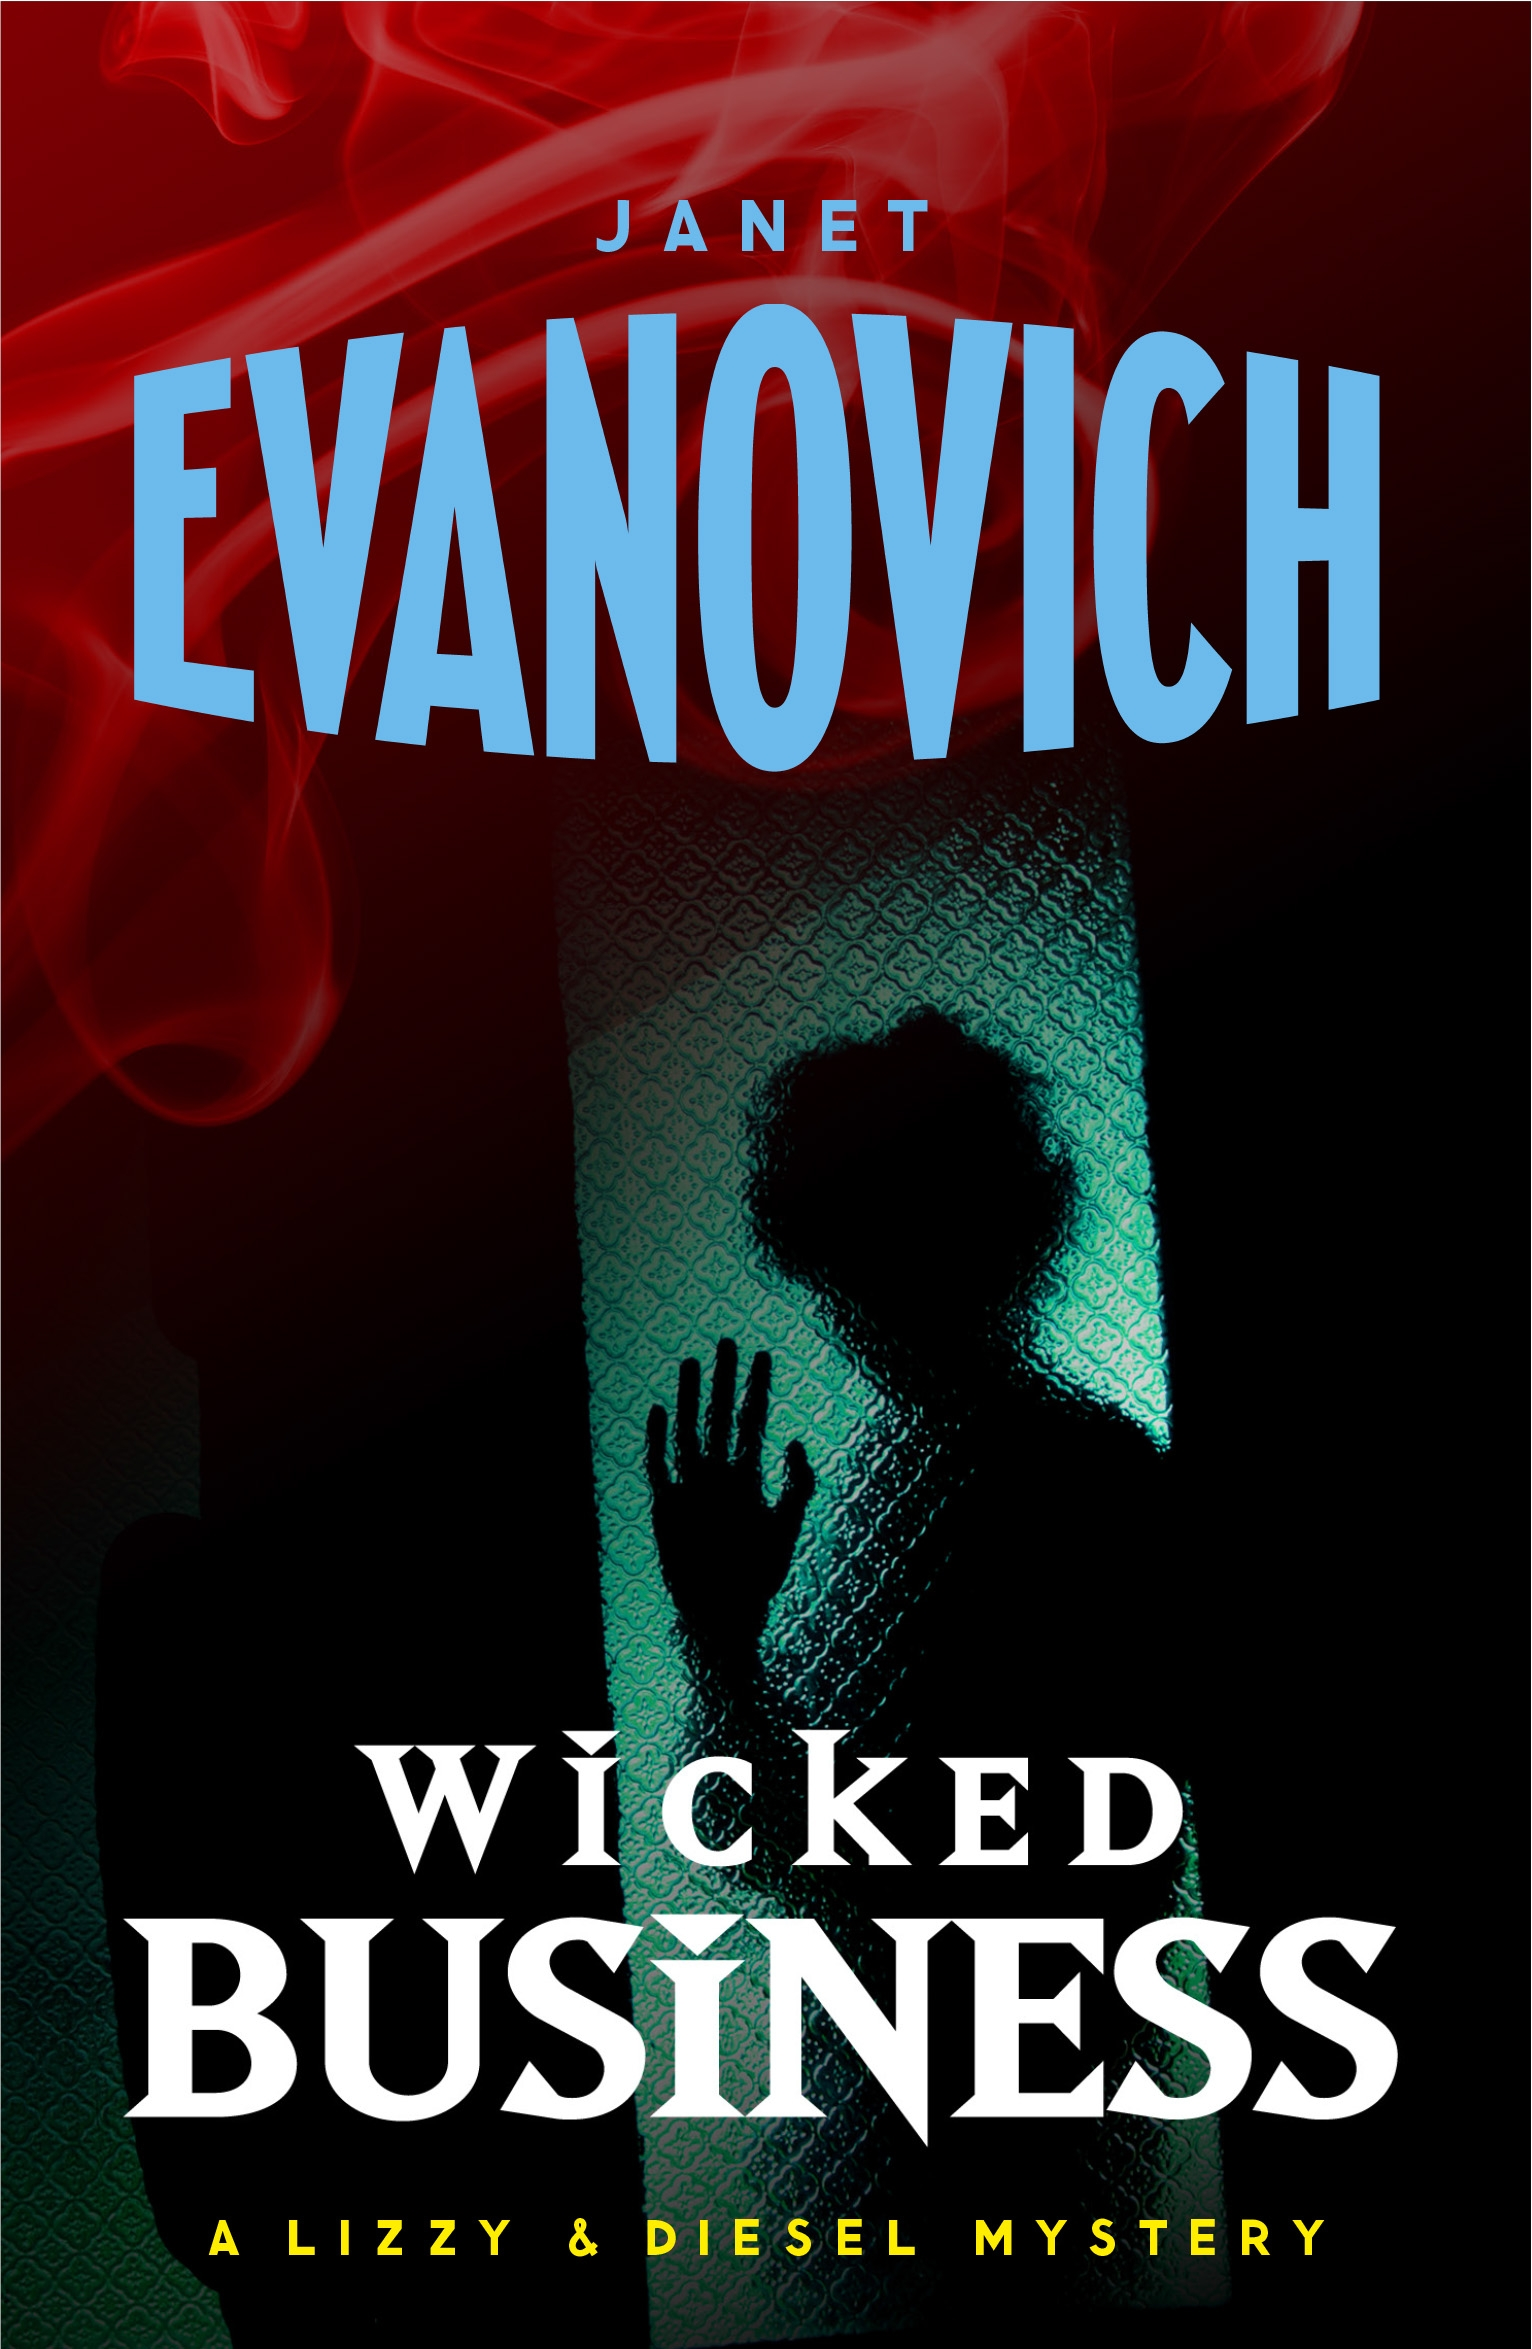 Janet Evanovich Ebook